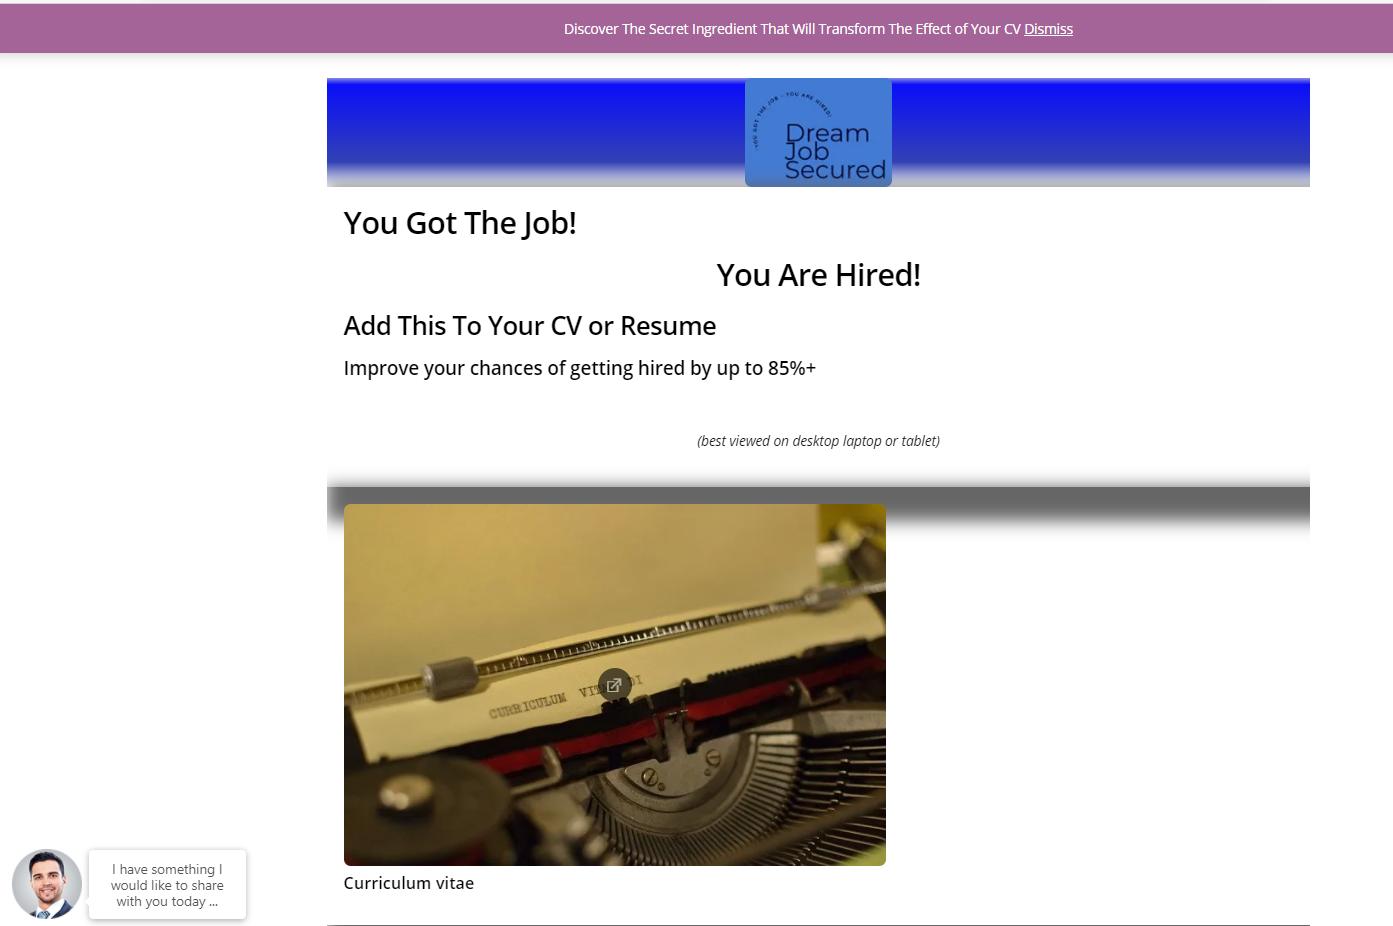 Dream Job Secured